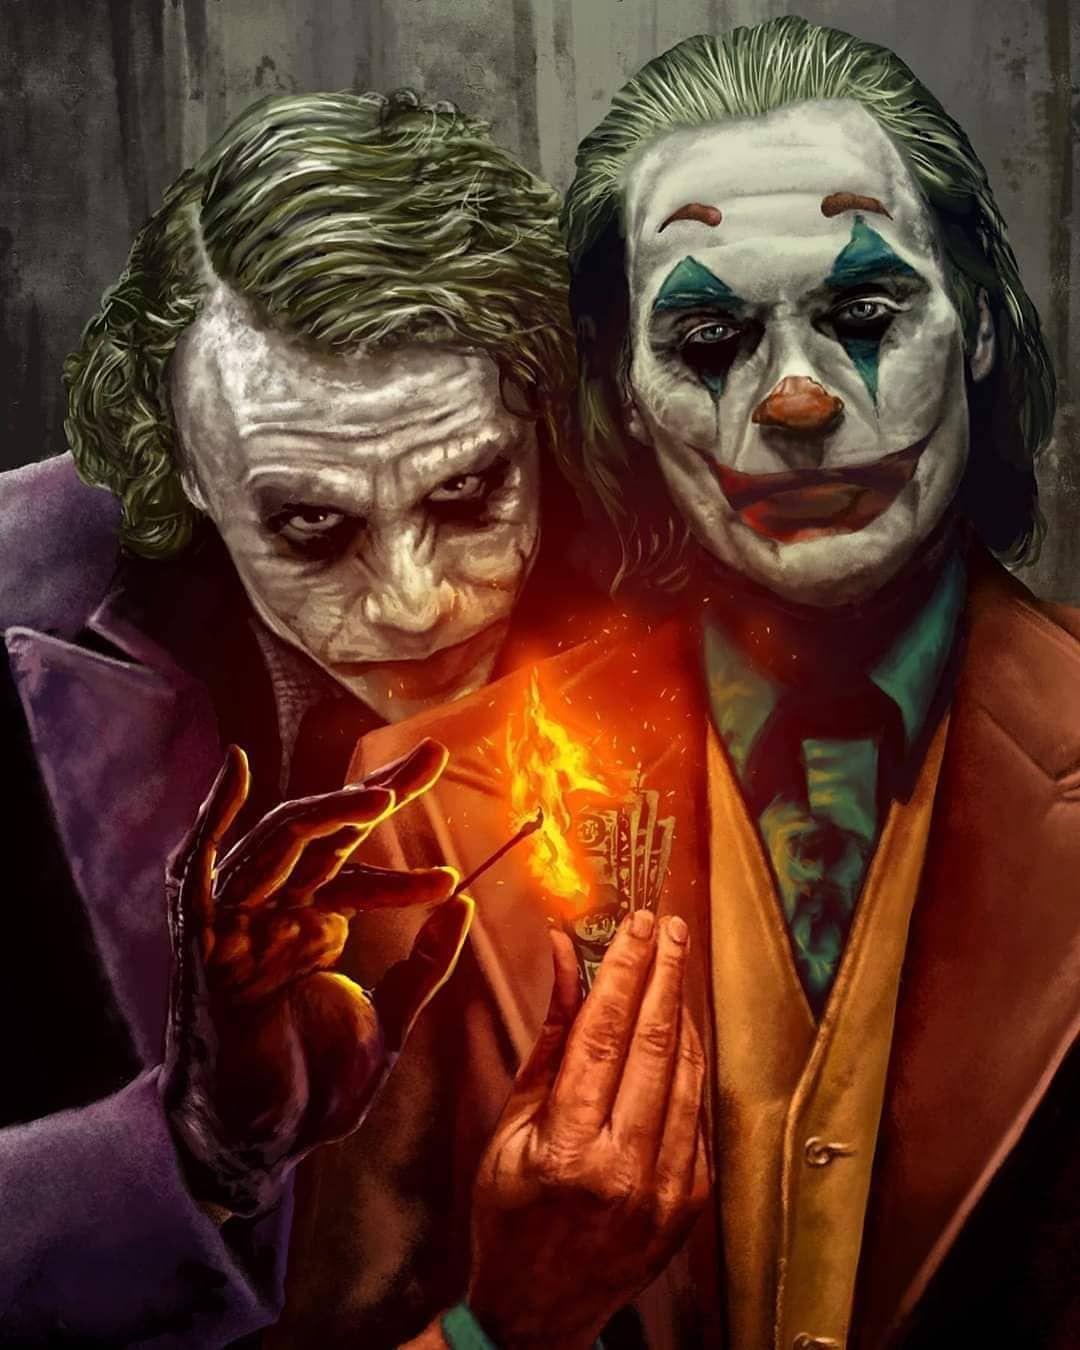 Jokers Joker Art Batman Joker Wallpaper Joker Artwork [ 1350 x 1080 Pixel ]